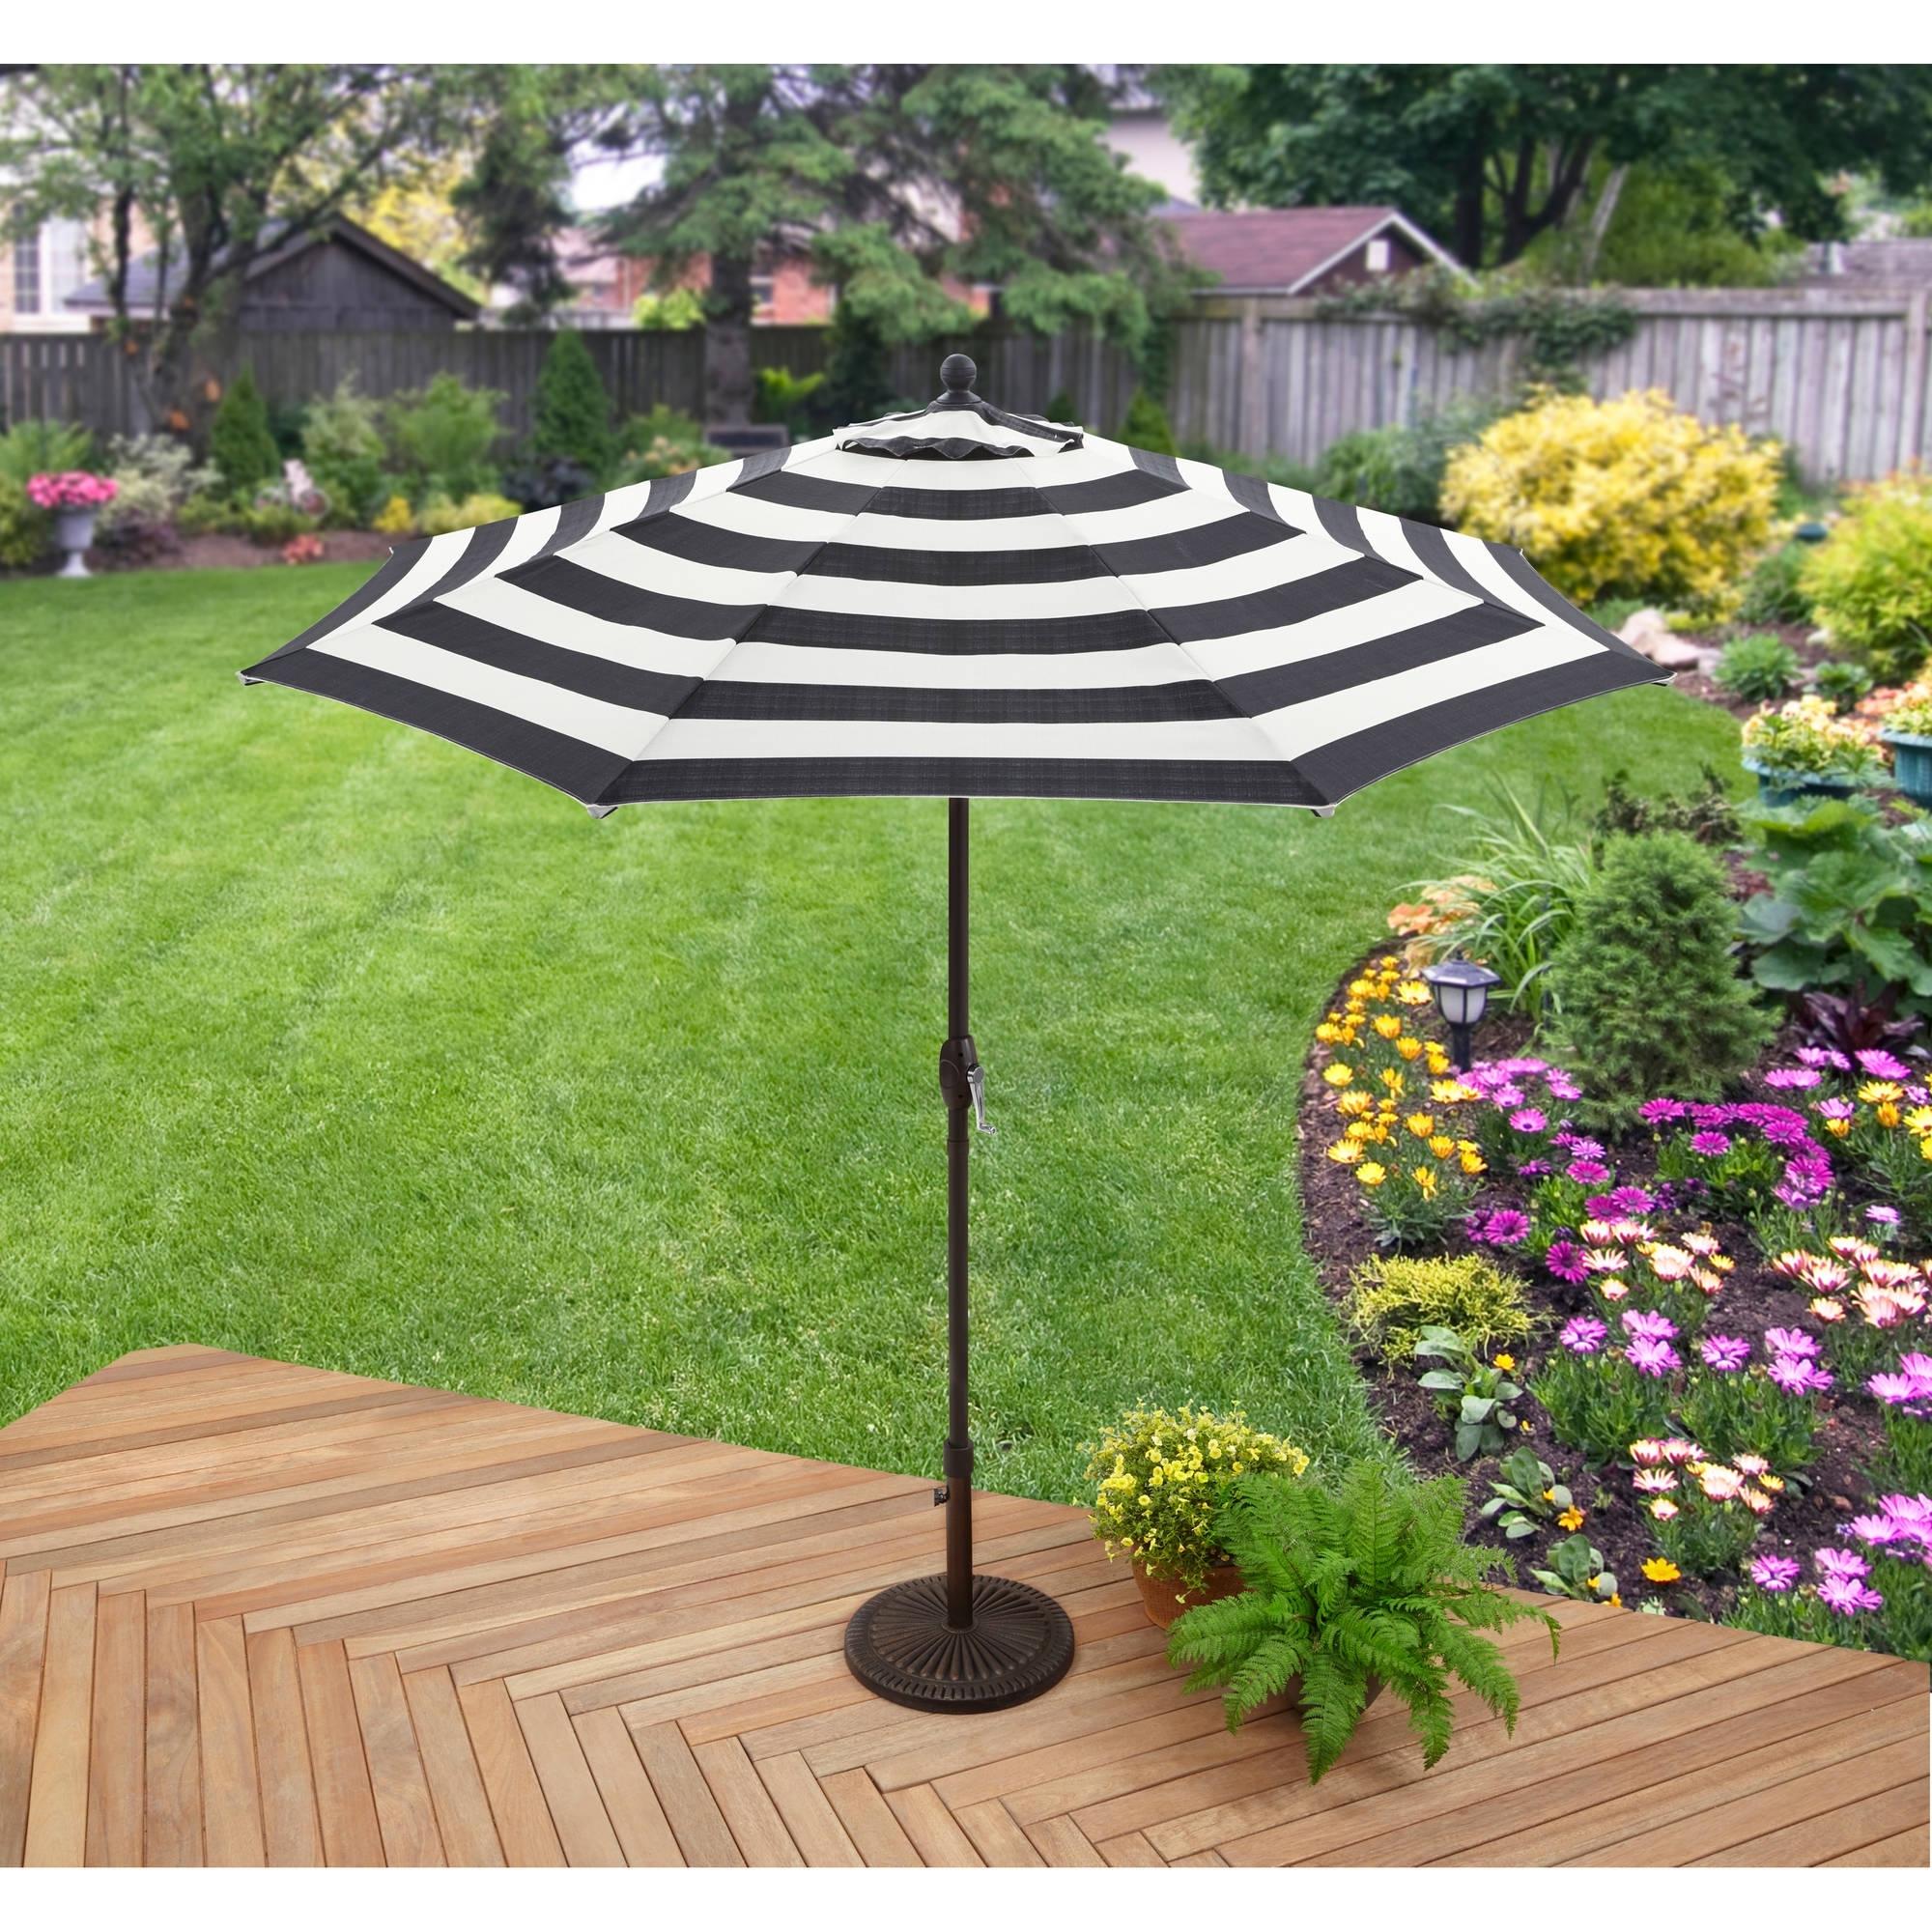 Better Homes And Gardens 9' Market Umbrella, Cabana Stripe – Walmart Regarding Widely Used Custom Sunbrella Patio Umbrellas (View 13 of 20)